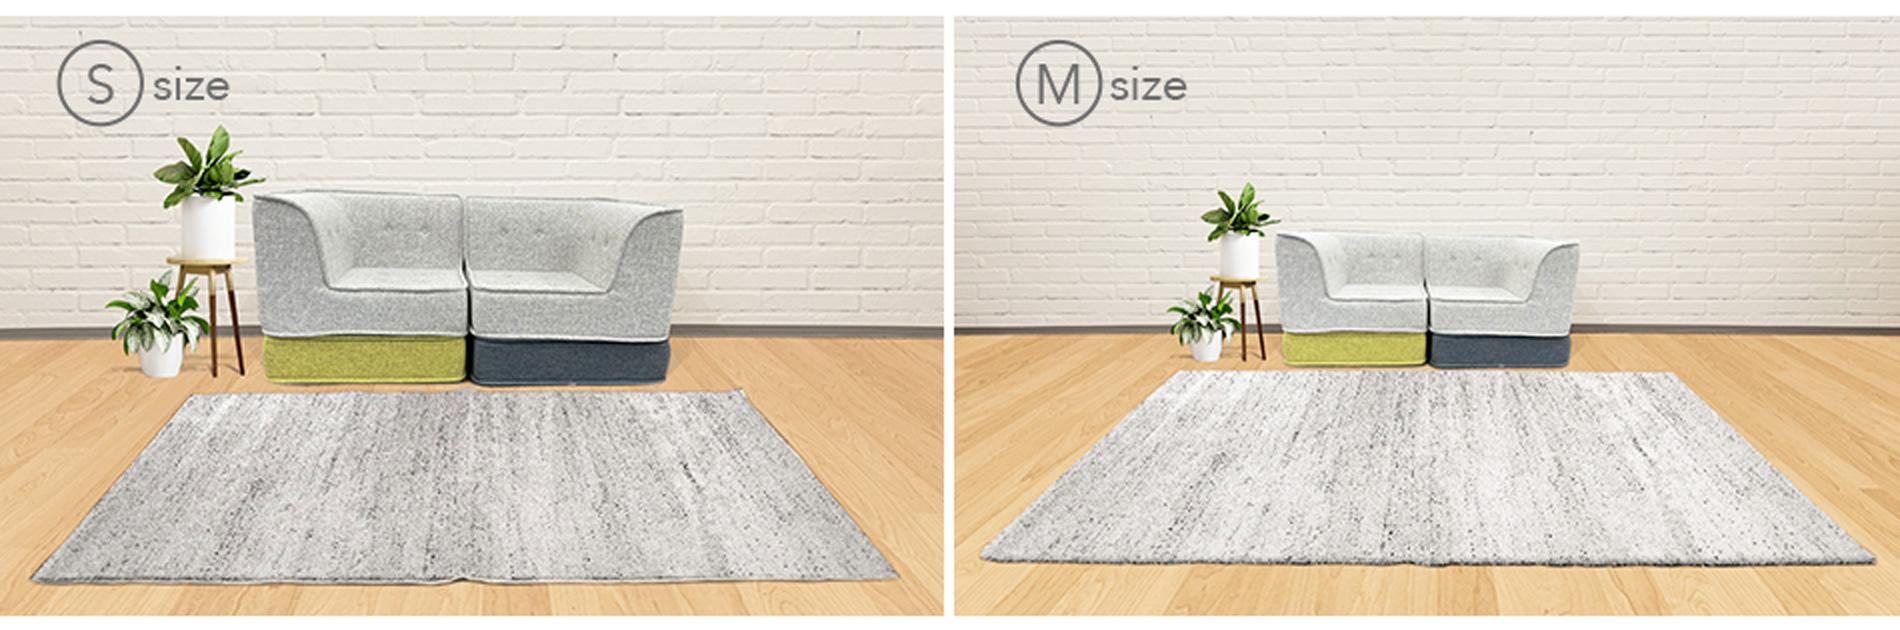 Sサイズ/Mサイズ